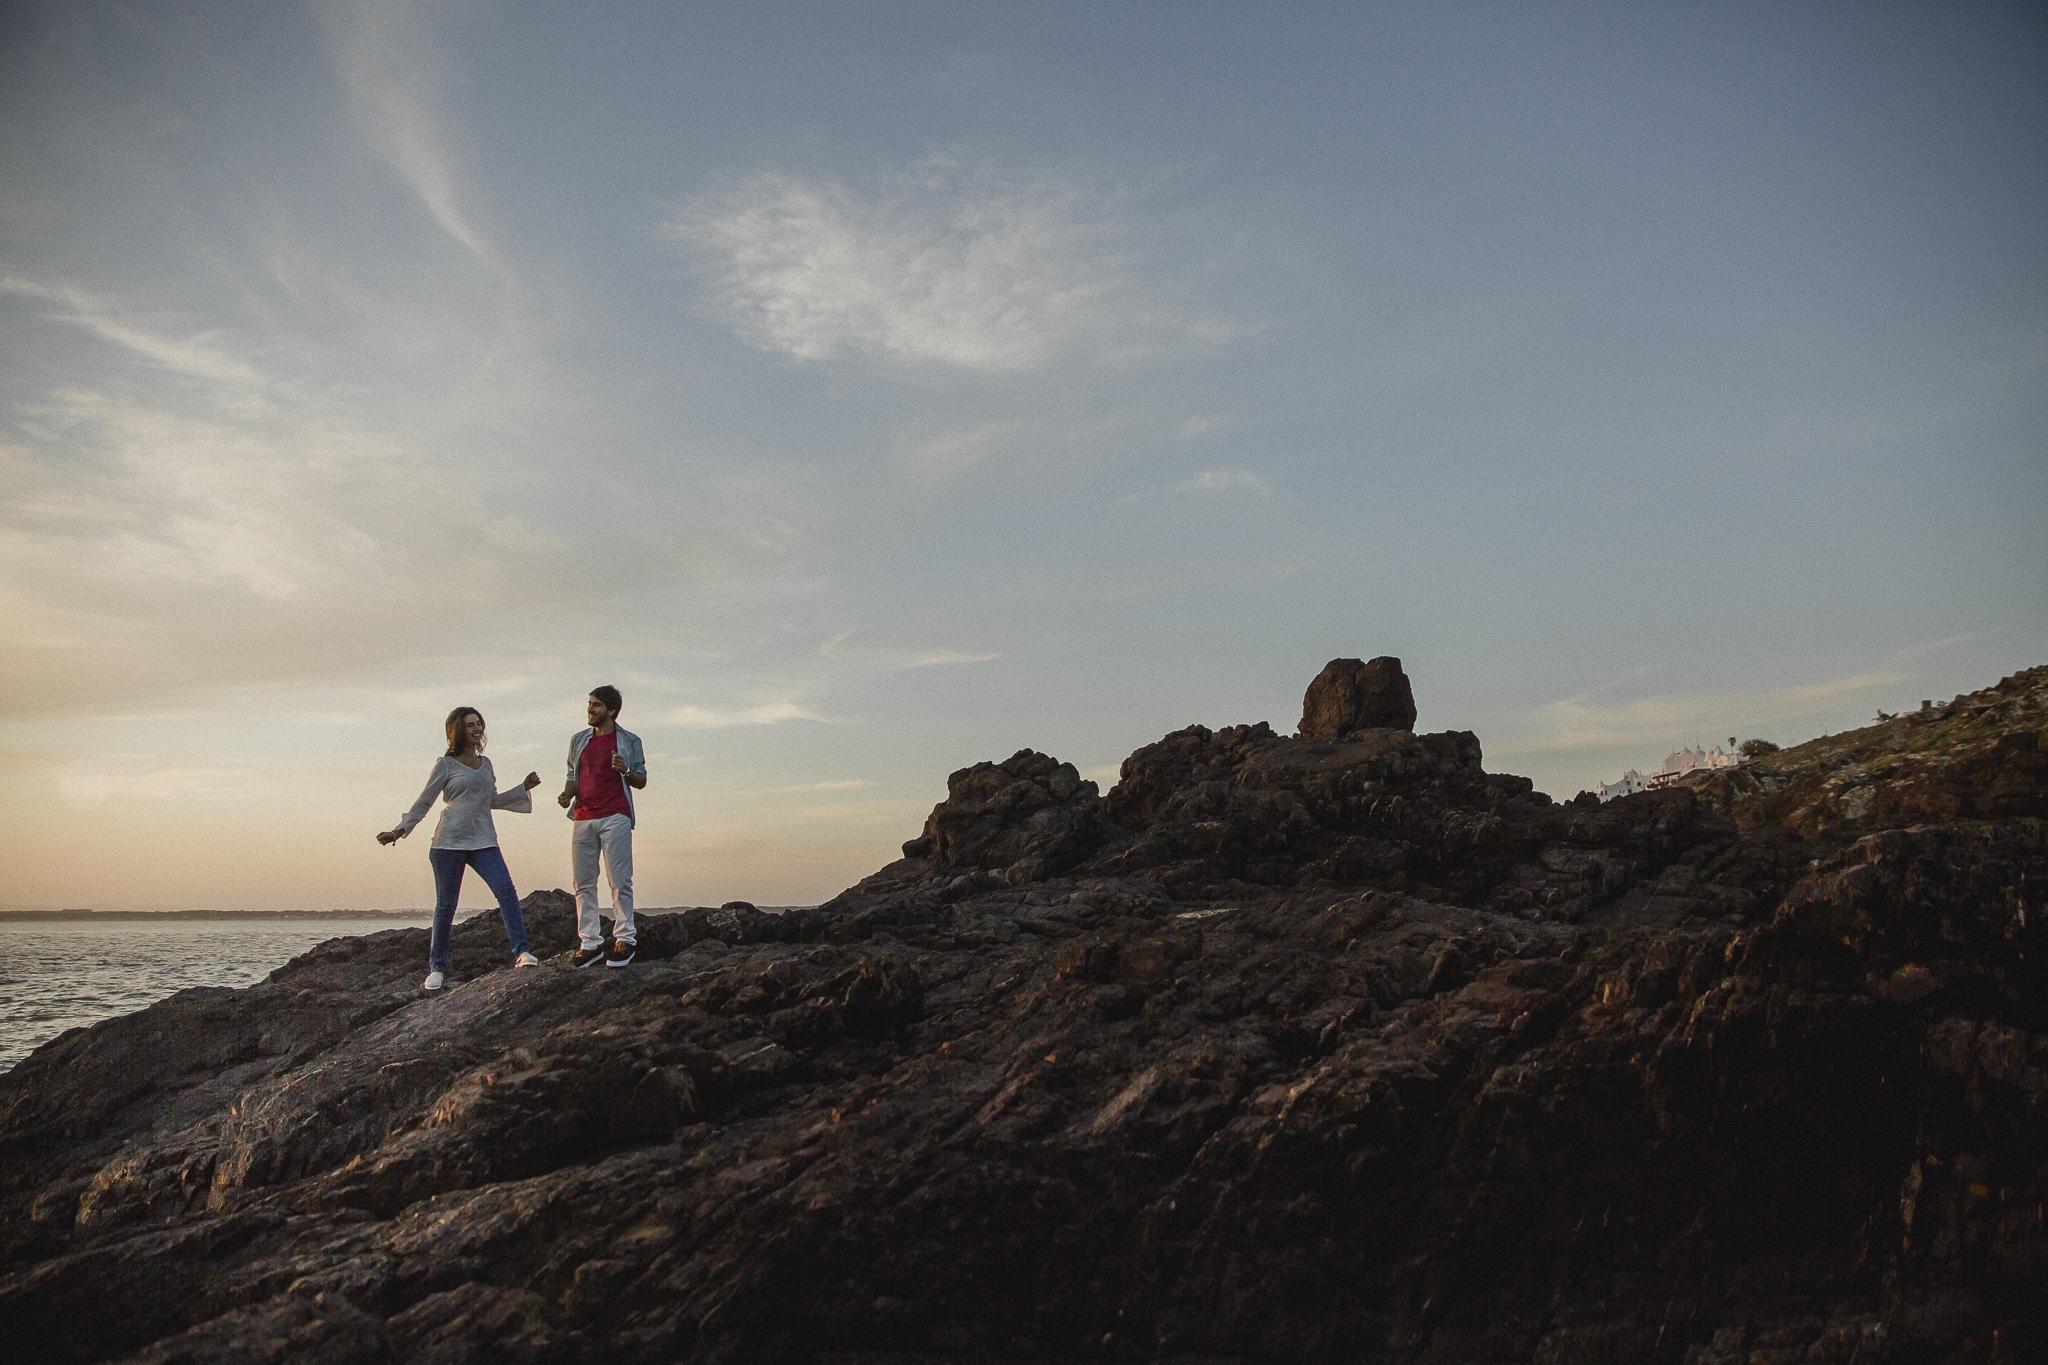 Grutas de Punta Ballena, Turismo Punta del este, Casapueblo, Mika Alvarez